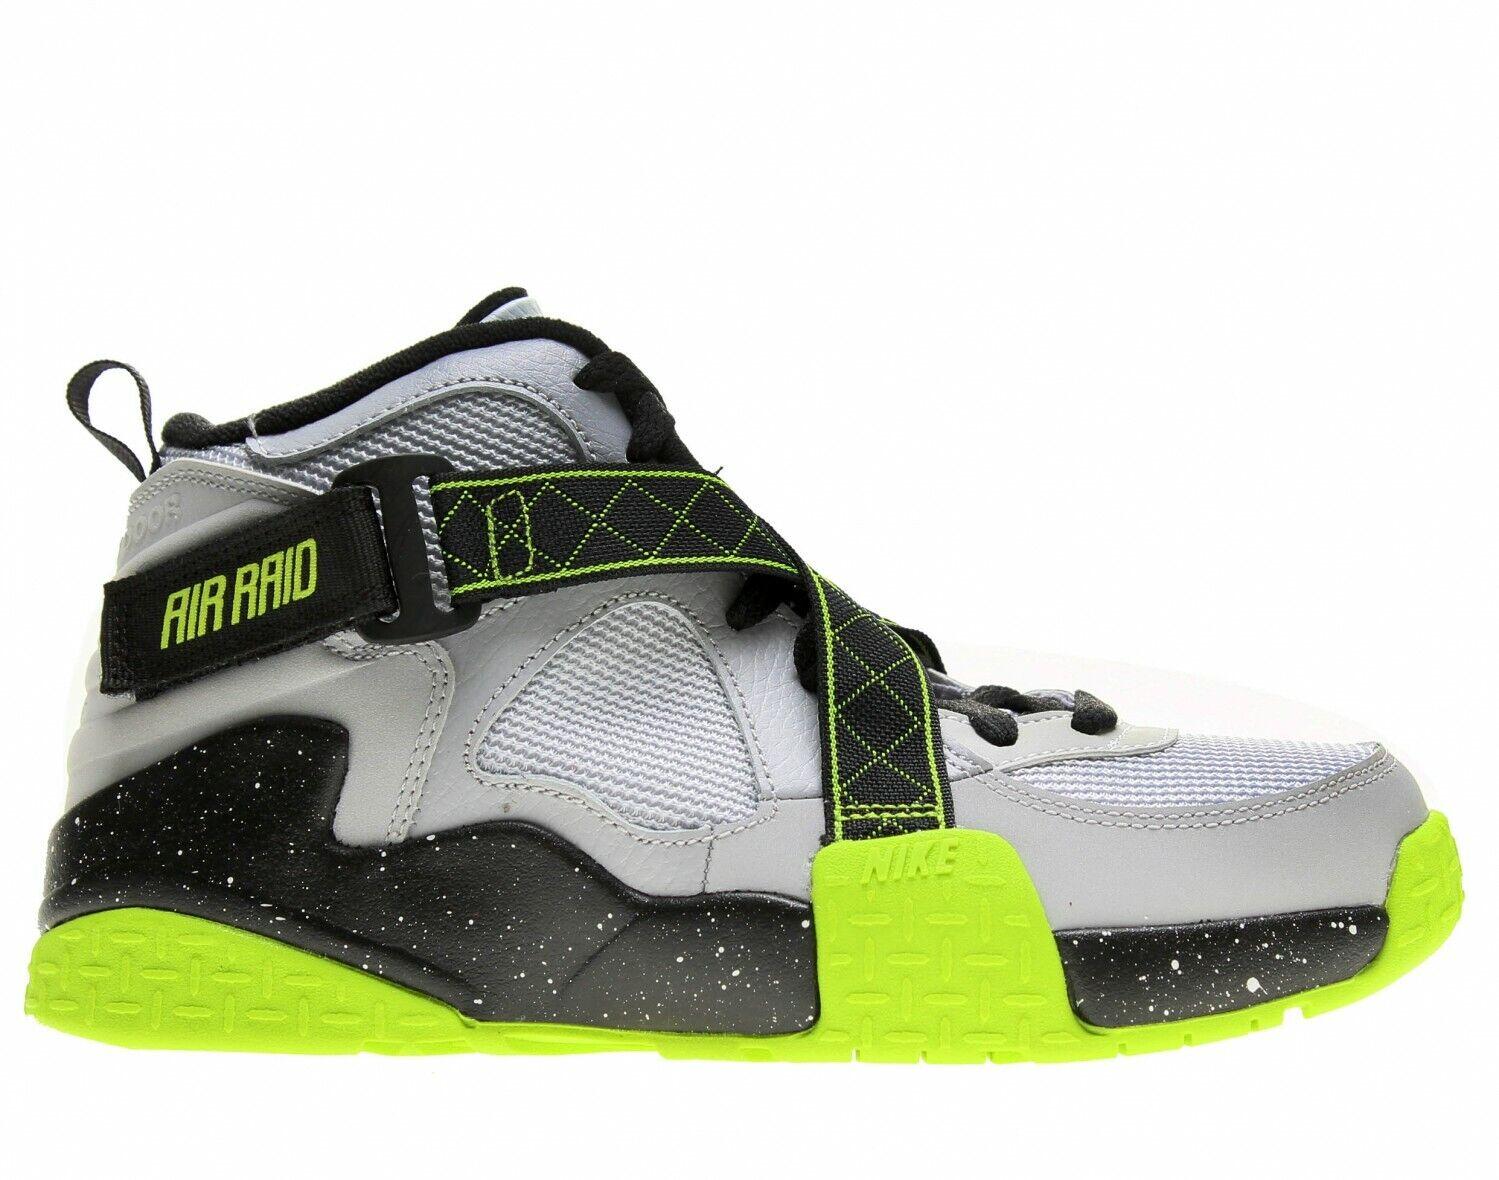 619b3d3f Nike Kid's Air RAID (gs) Basketball Shoes Size 6y